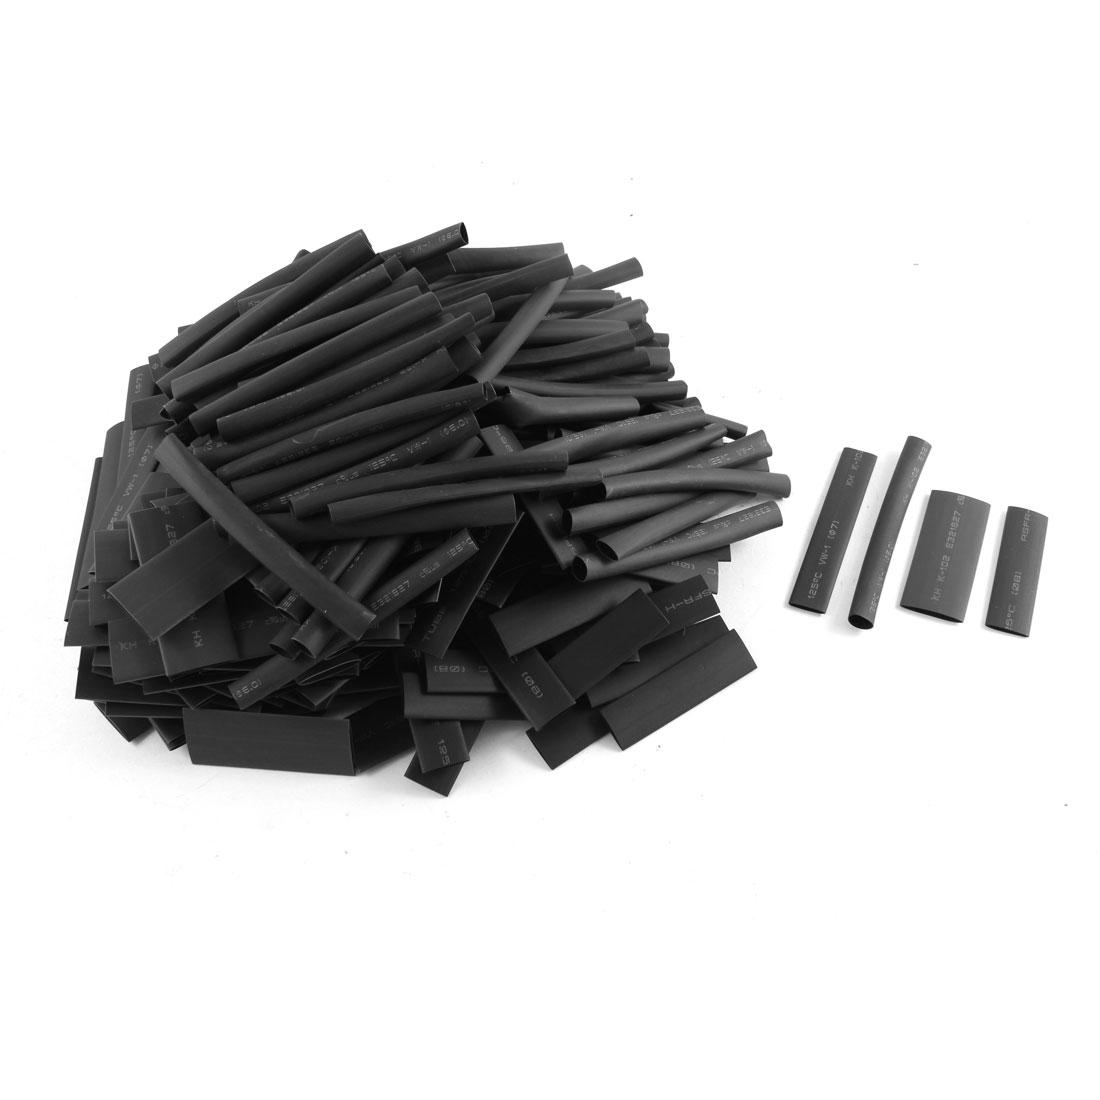 400pcs Black 2:1 Heat Shrink Tubing Shrinkable Tube Pipe Cable Sleeve Cover Wrap 4 Sizes